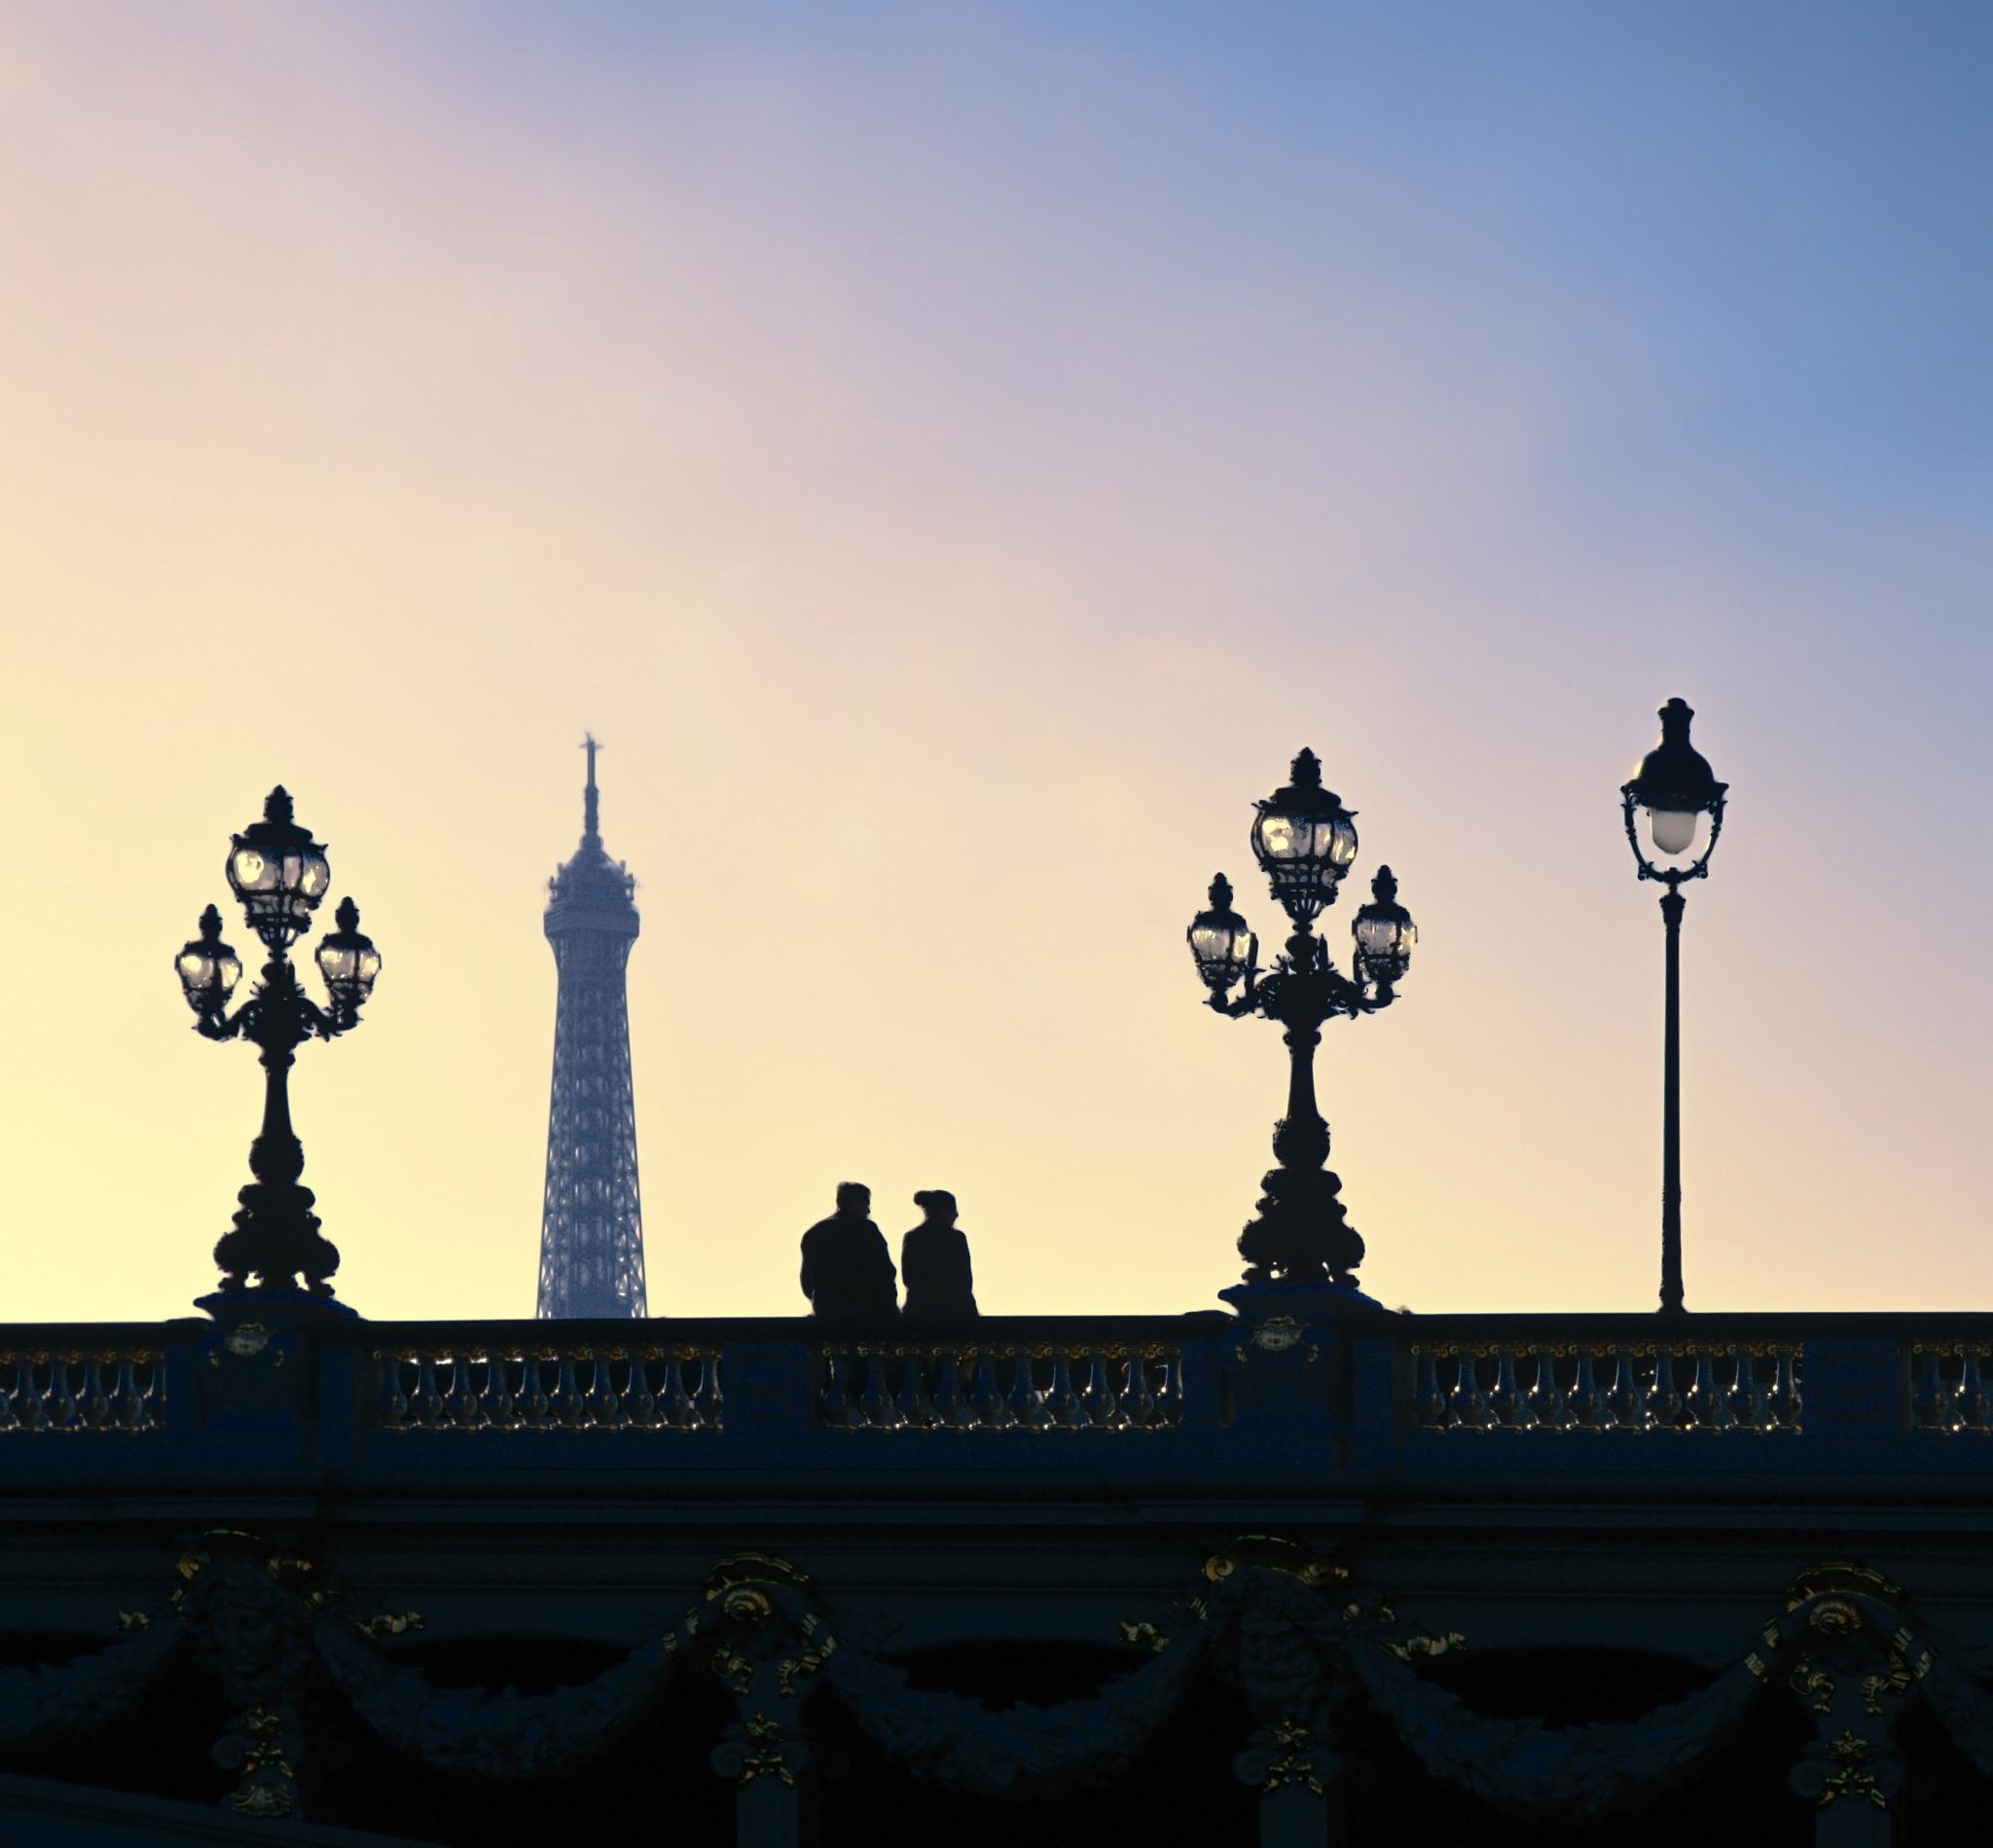 Par på Pont Alexandre bron med Eiffel tornet i bakgrunden.